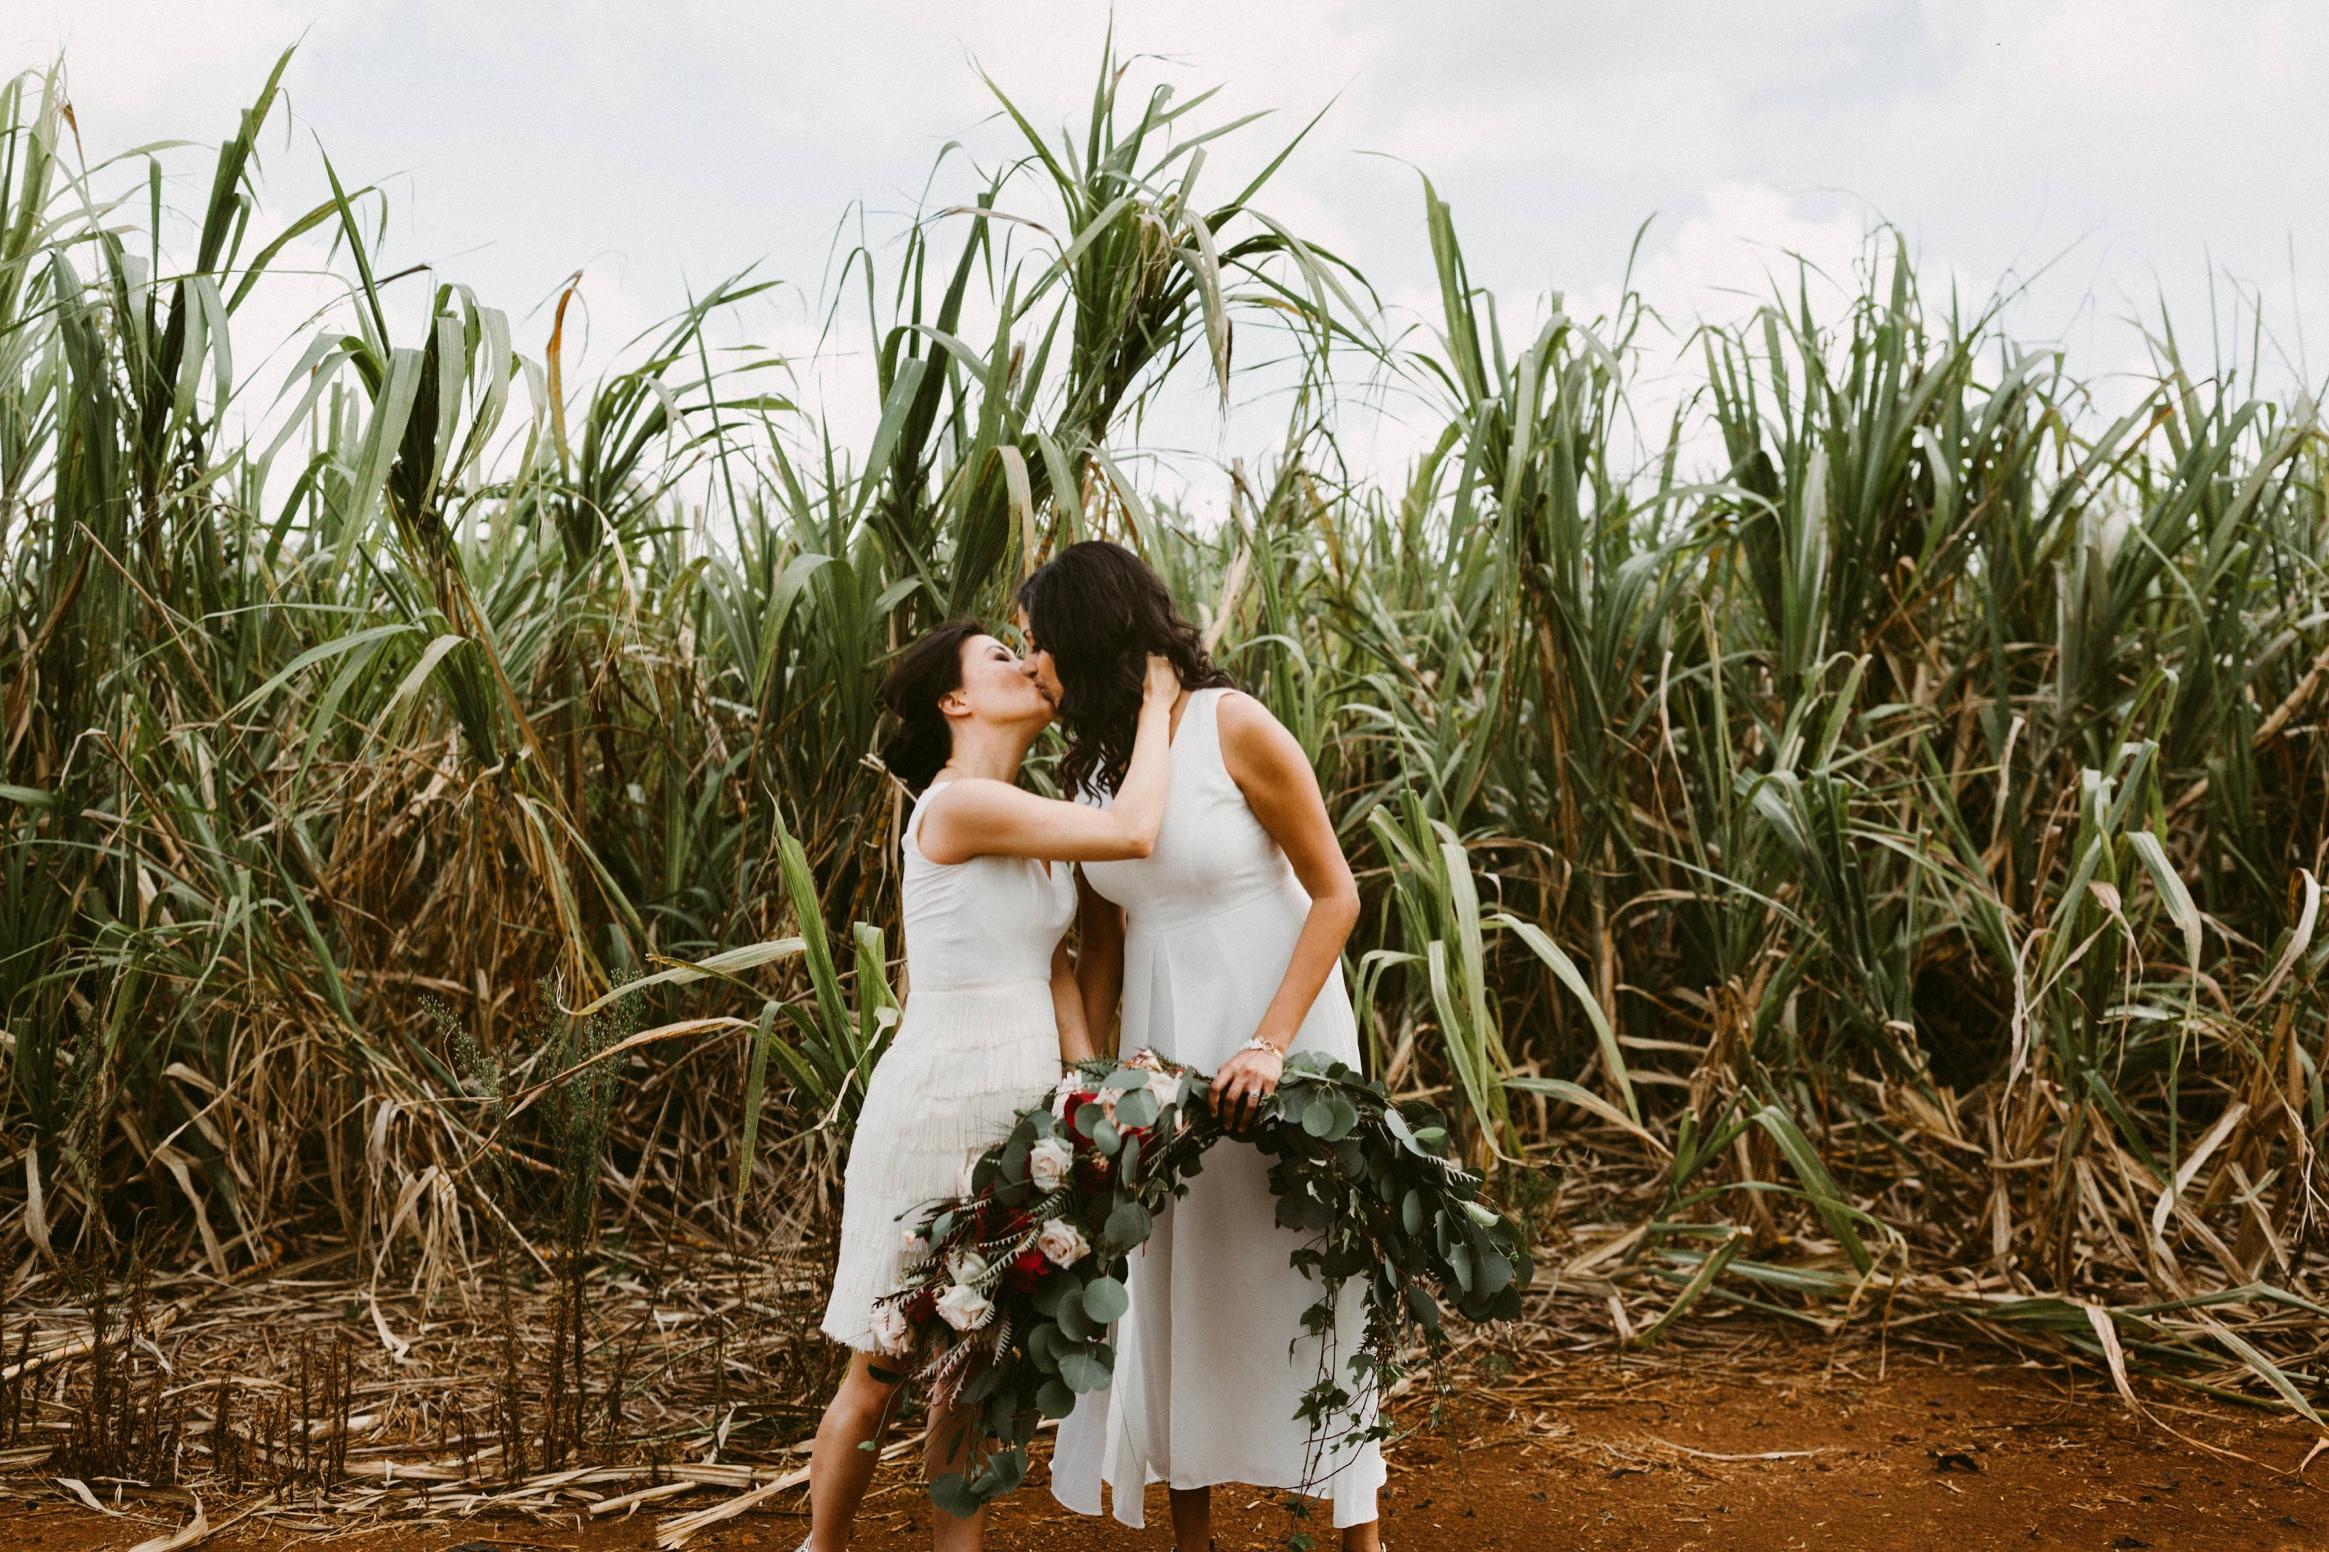 33_Oahu Hawaii Wedding  (113 of 294)_Oahu_sex_Hawaii_same_wedding_elopement_photographer.jpg